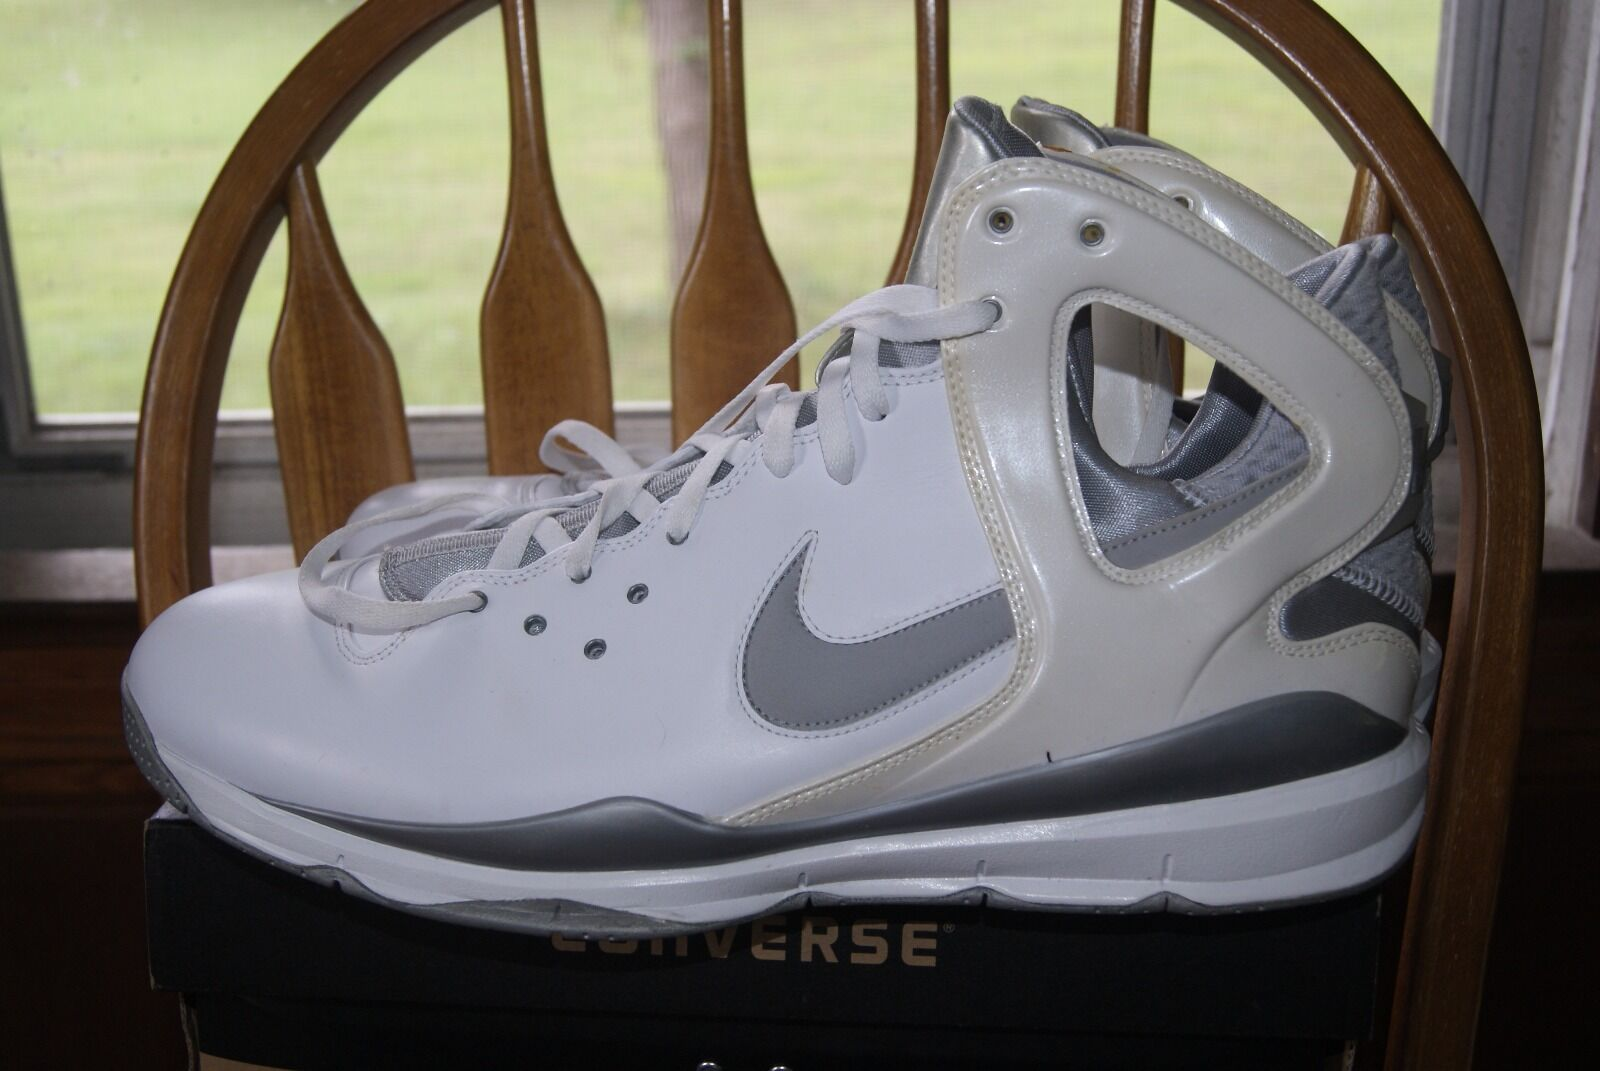 Nike huarache 08 - basketball - schuhe, weiße, graue turnschuhe 17,5